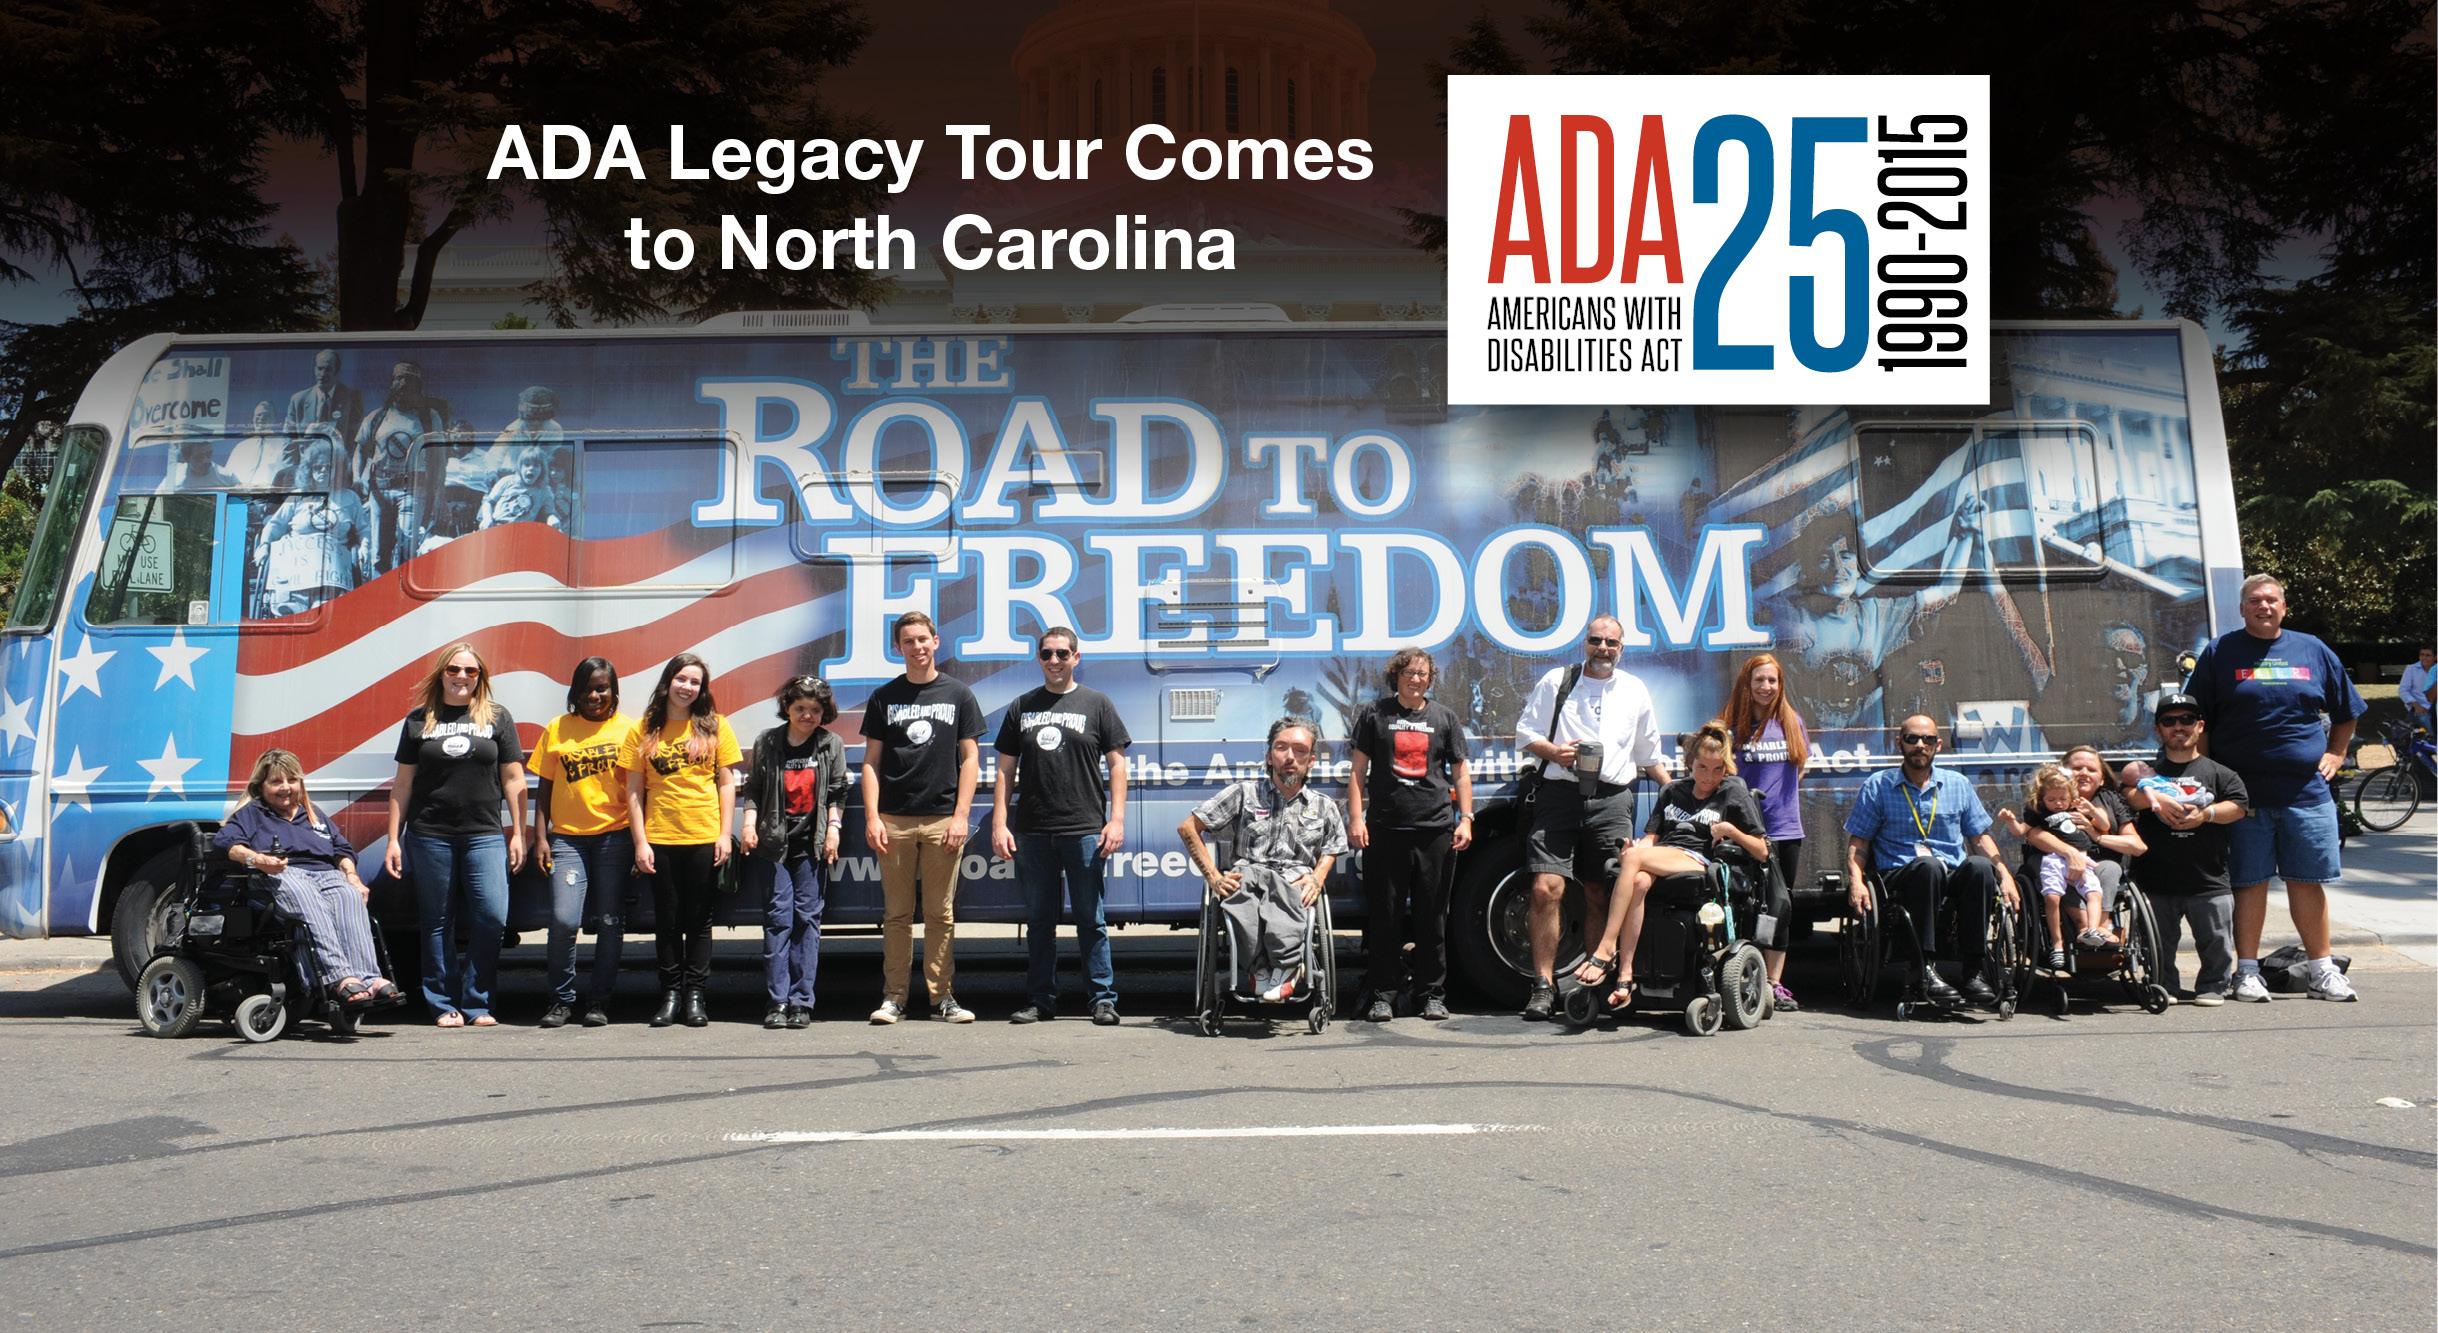 ADA Legacy Tour Comes to North Carolina